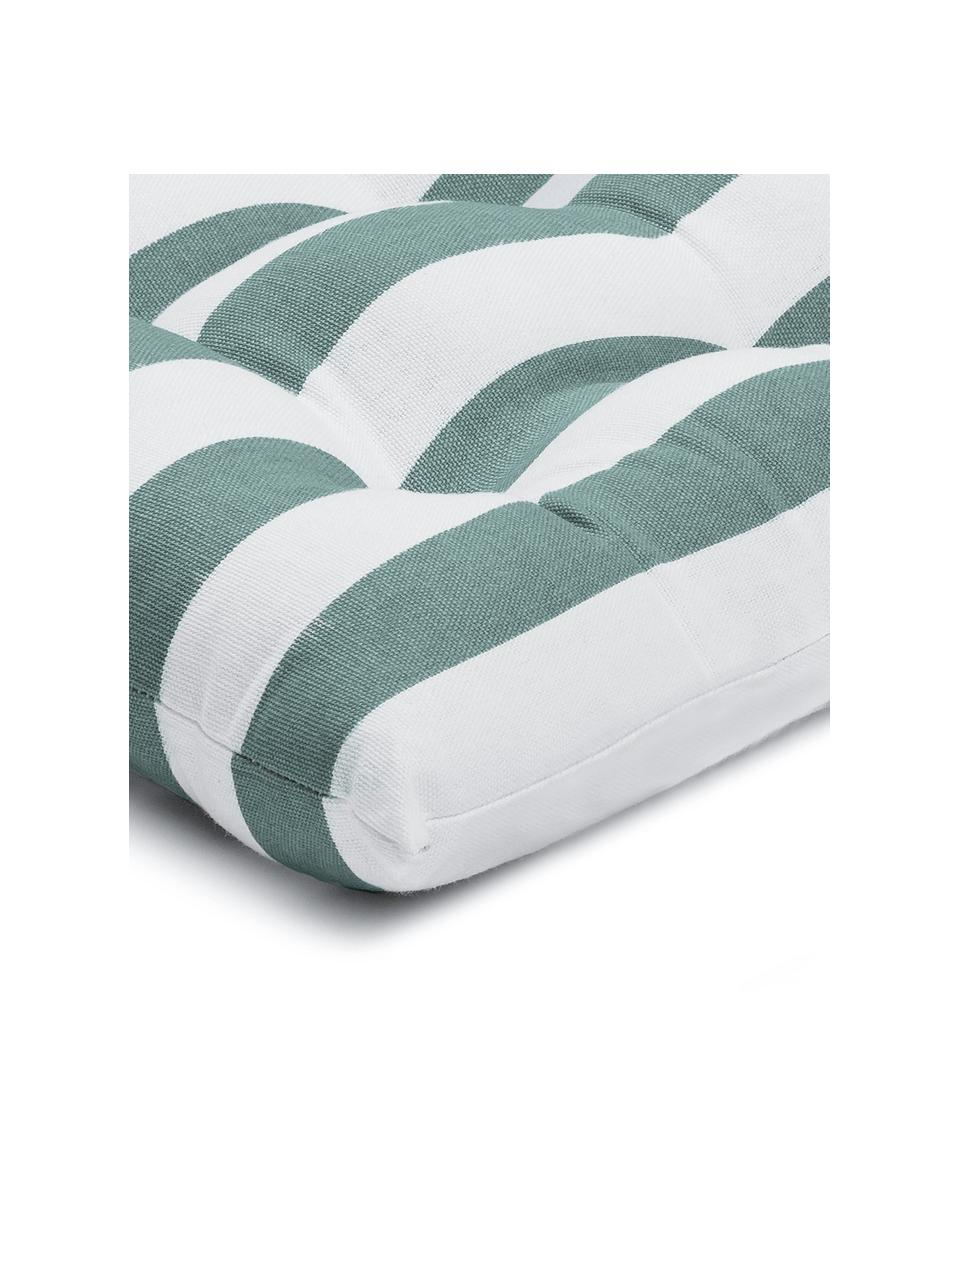 Cuscino sedia a righe verde salvia/bianco Timon, Rivestimento: 100% cotone, Verde, Larg. 40 x Lung. 40 cm